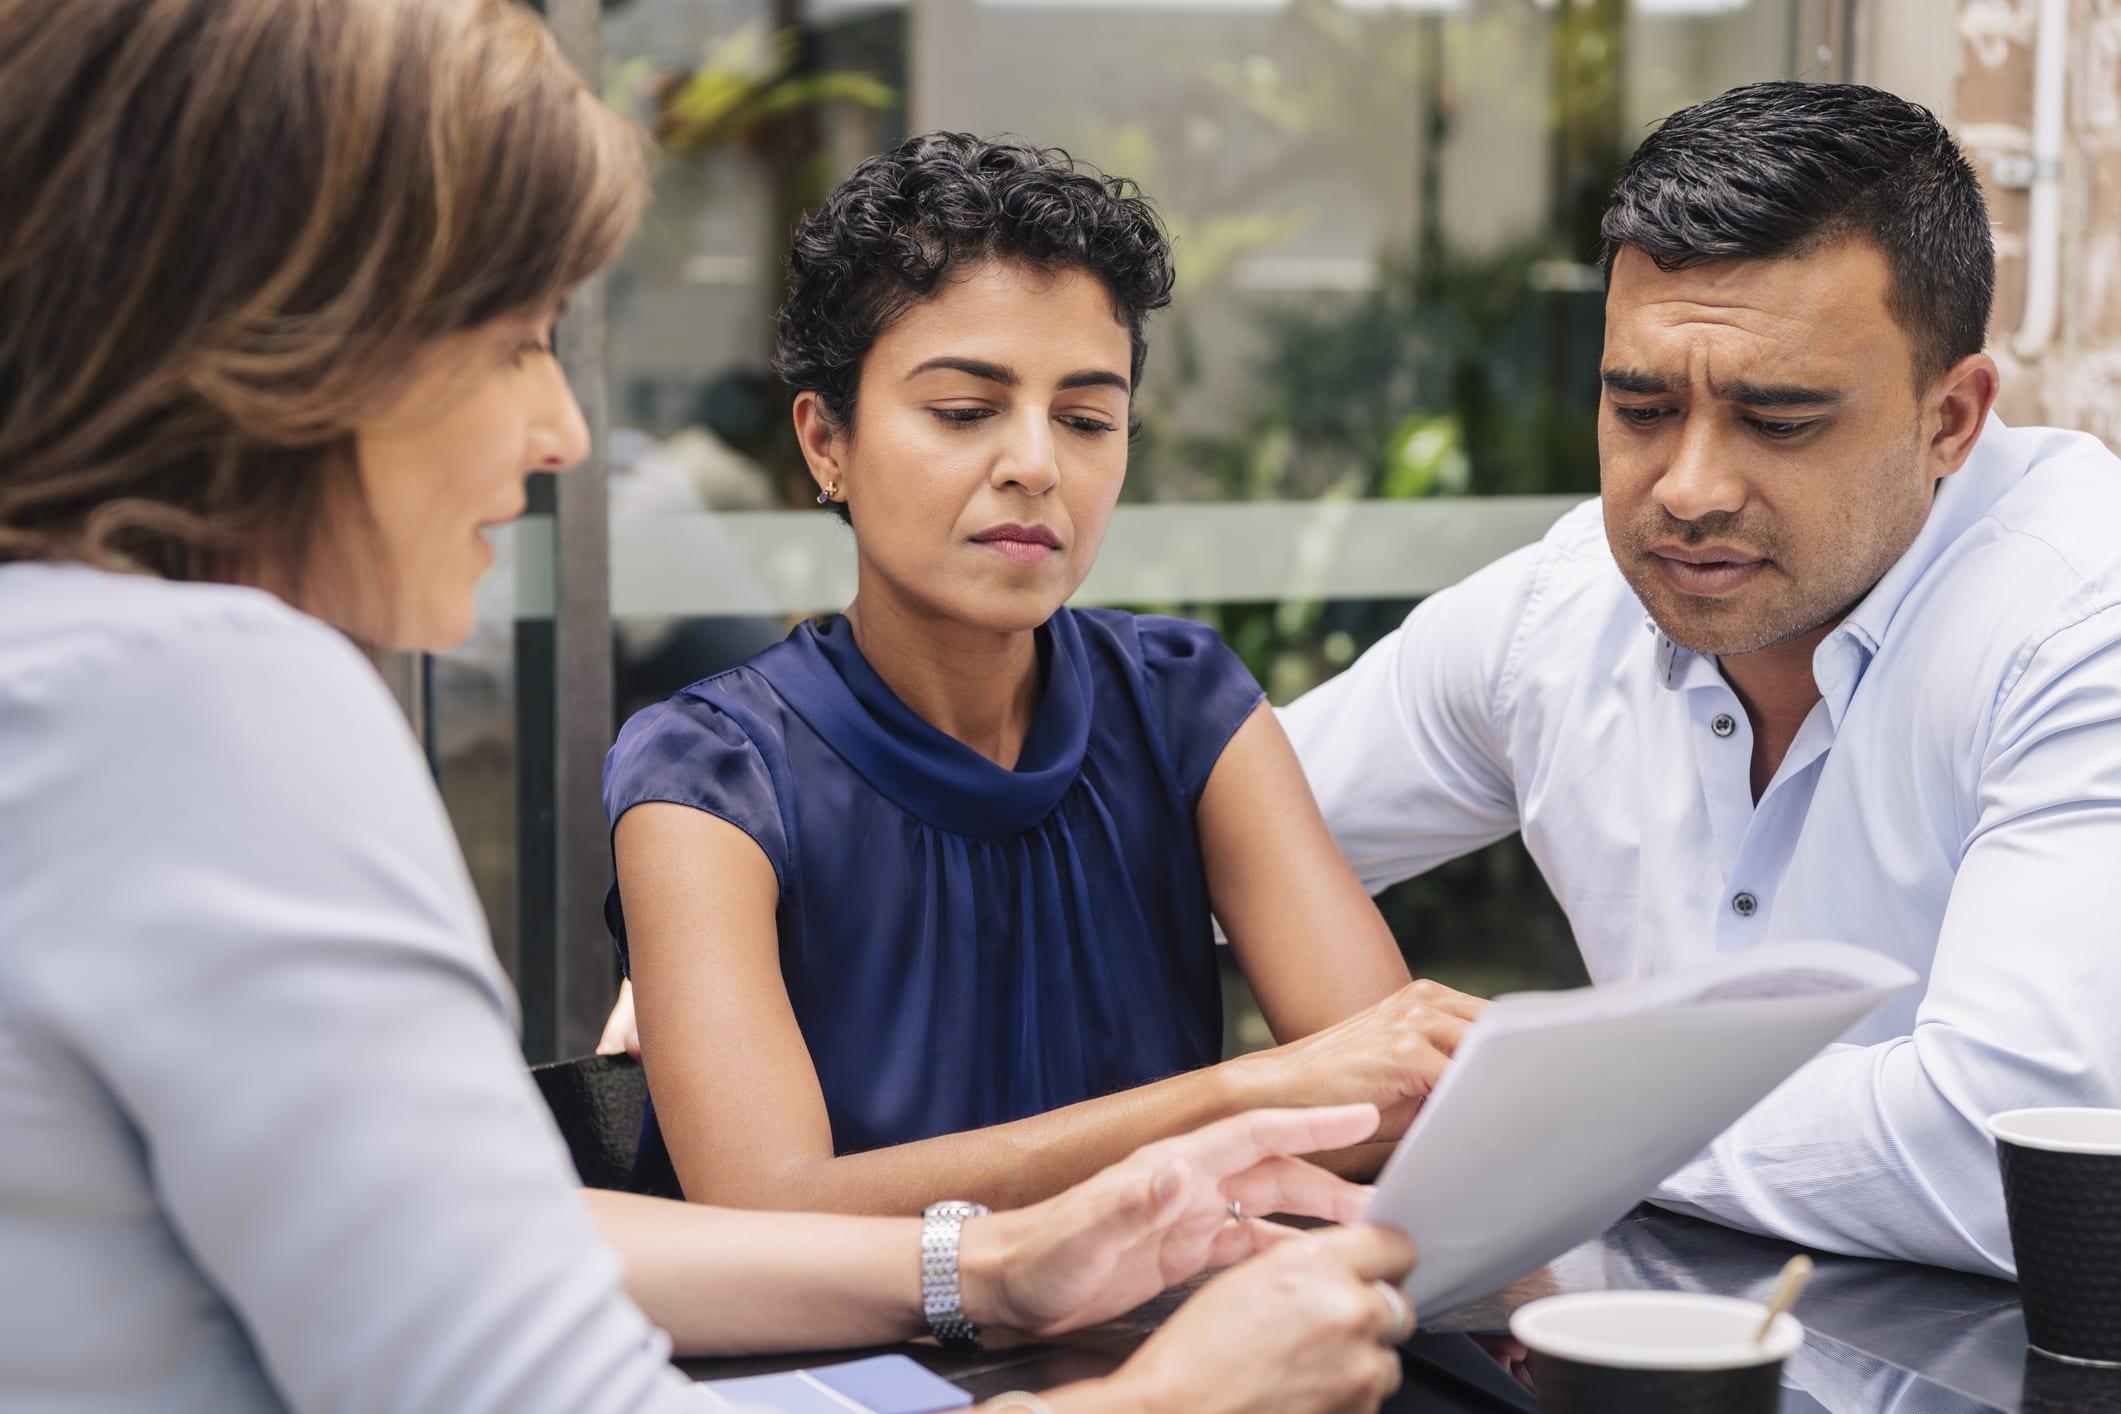 Op-Ed: Financial advisors help clients navigate through uncertainty